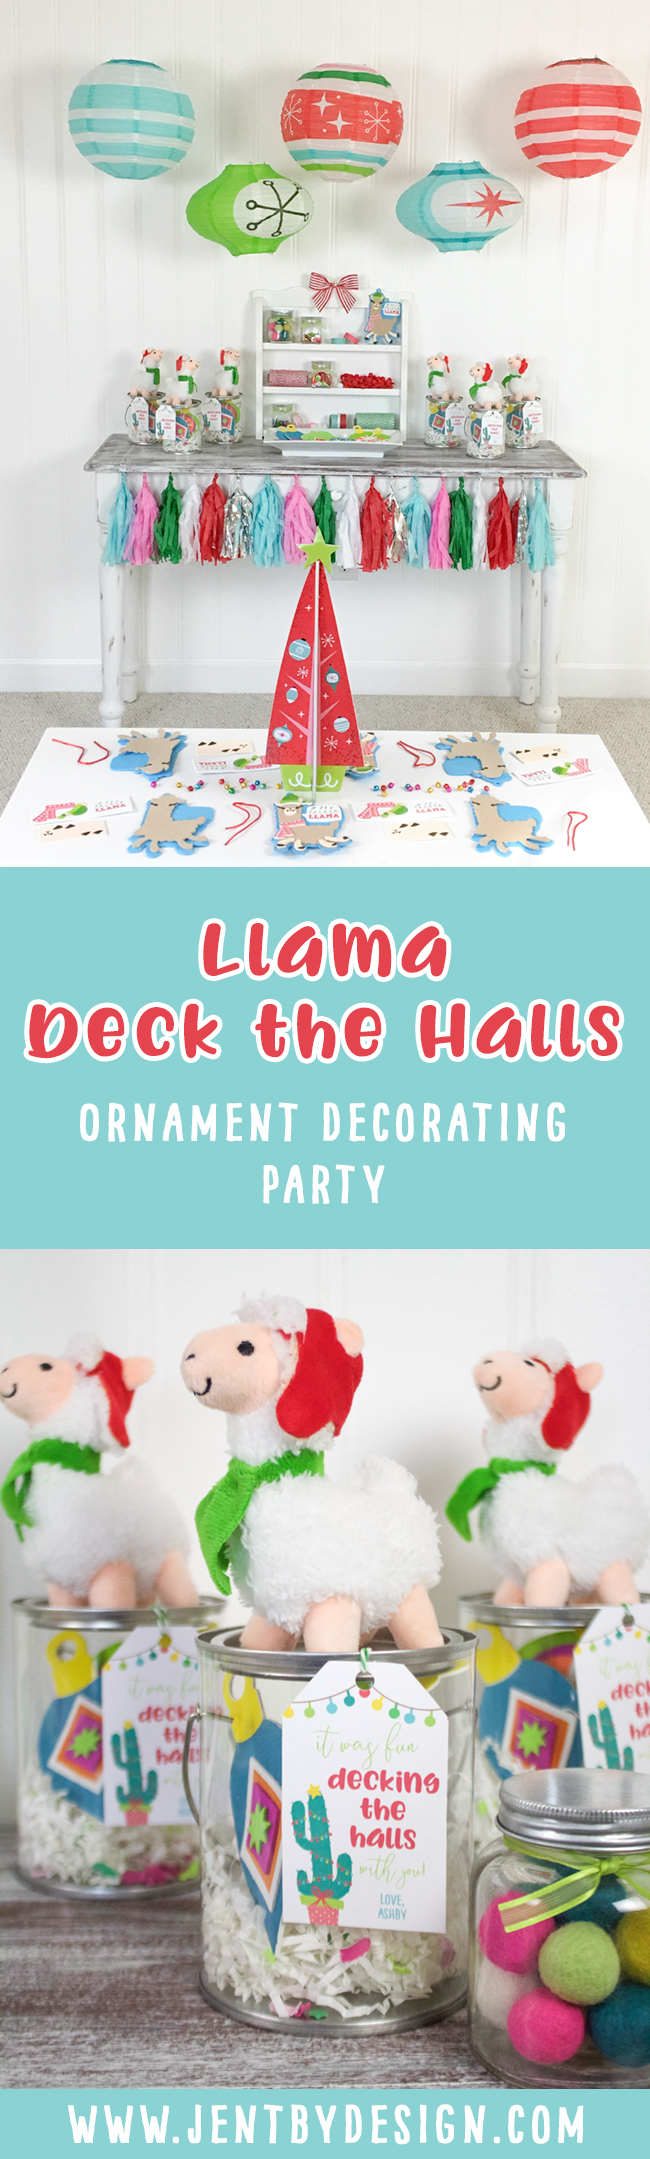 Kids Ornament Decorating Party - Llama Deck the Halls 1.jpg